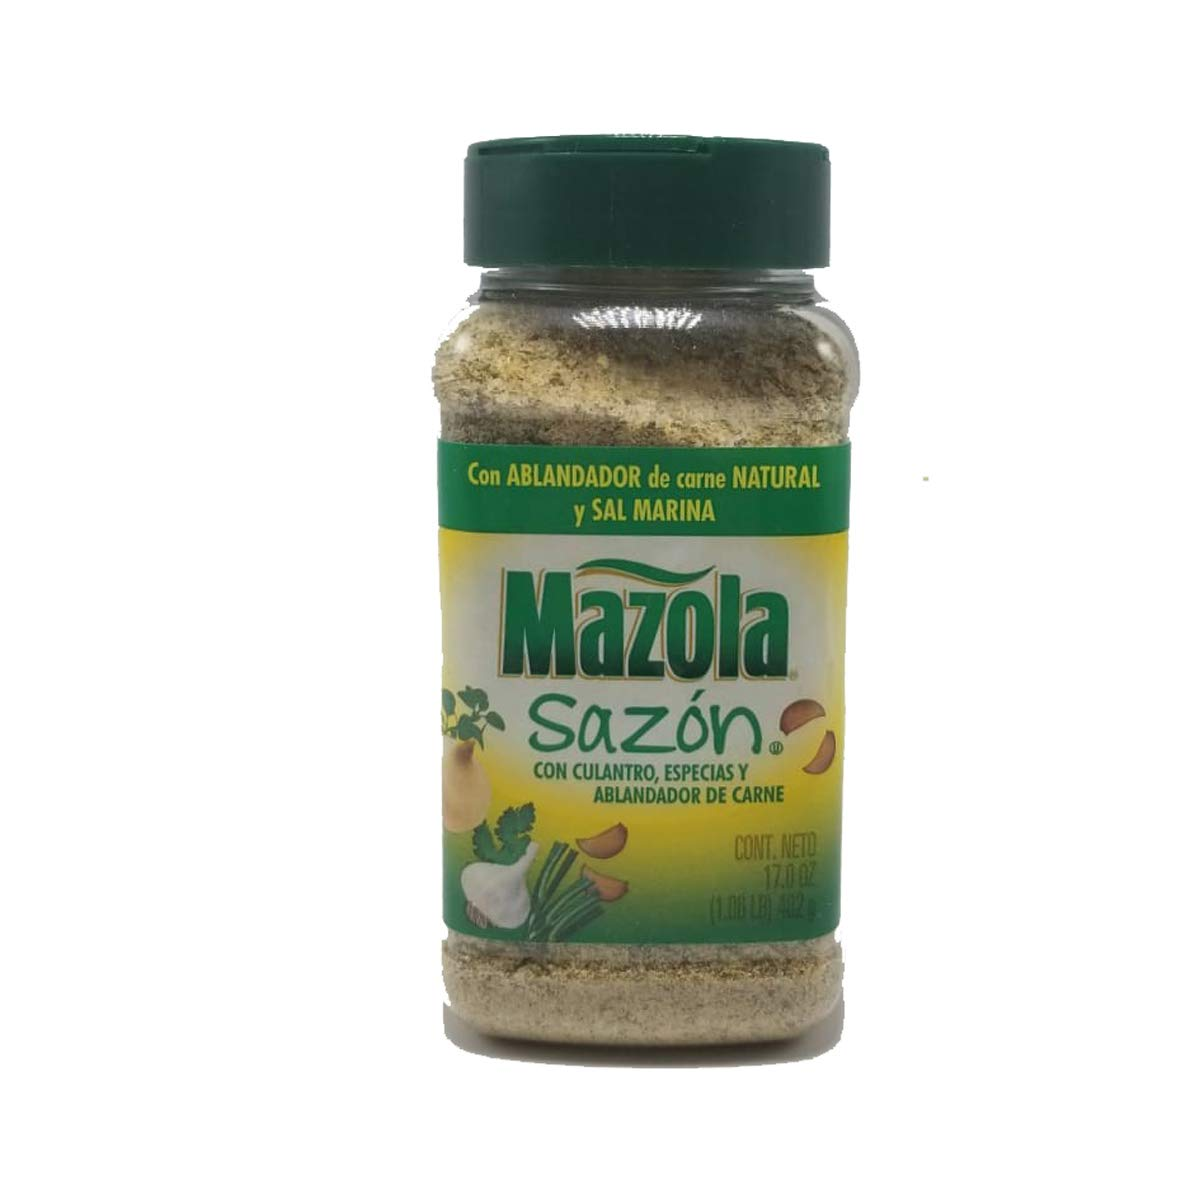 Atlanta Mall Mazola Sazon Culantro con Popular product